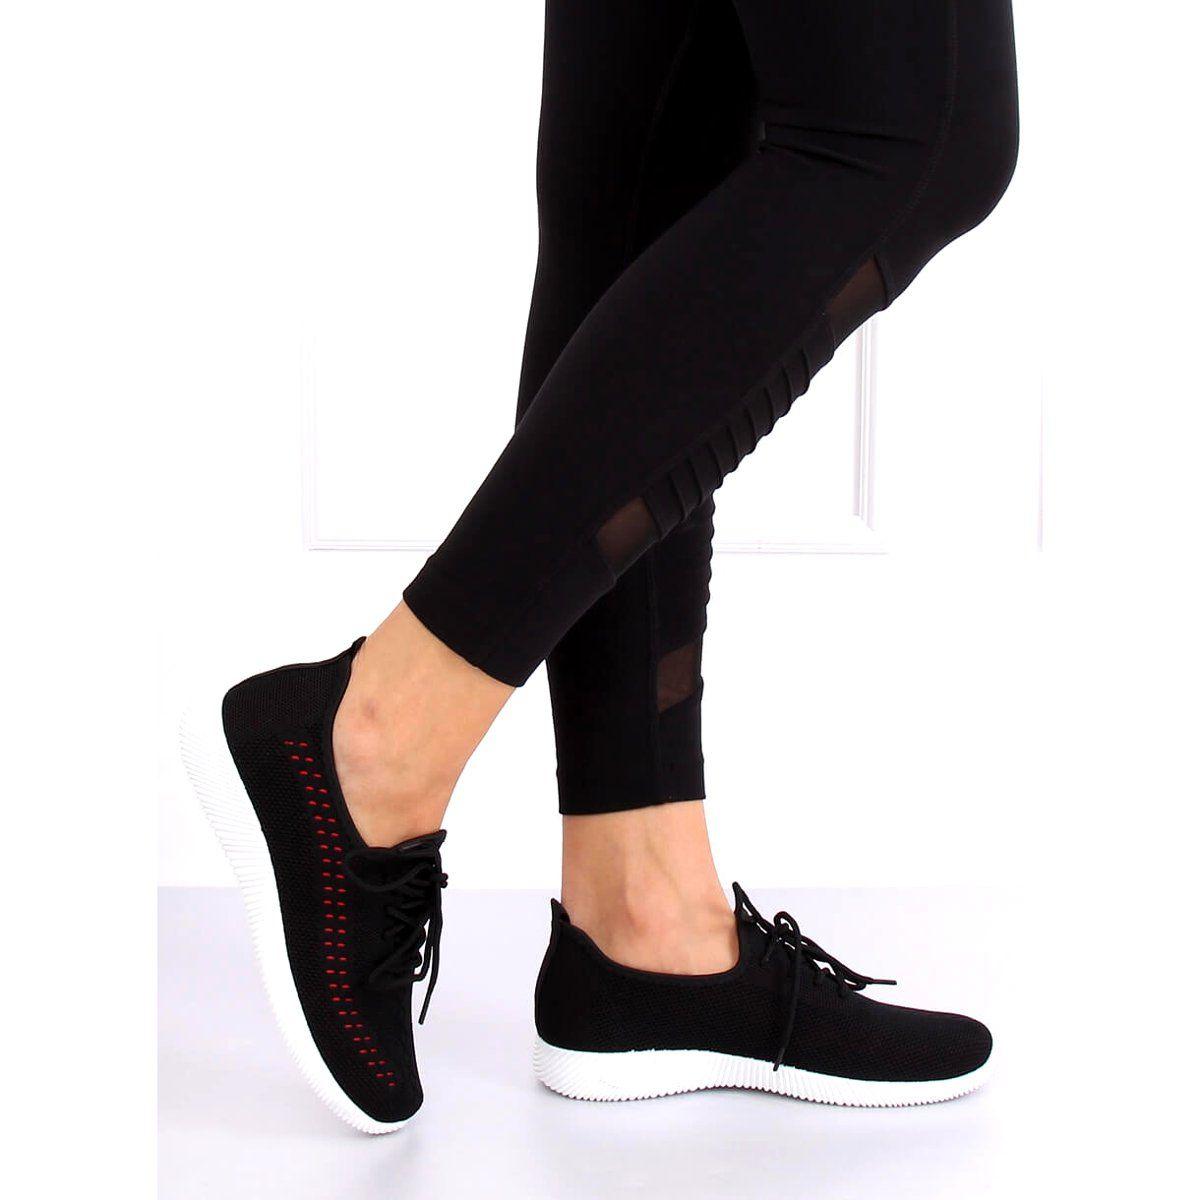 Buty Sportowe Czarne Mg1517 Black Dress Shoes Men Cole Haan Zerogrand Oxford Dress Shoes